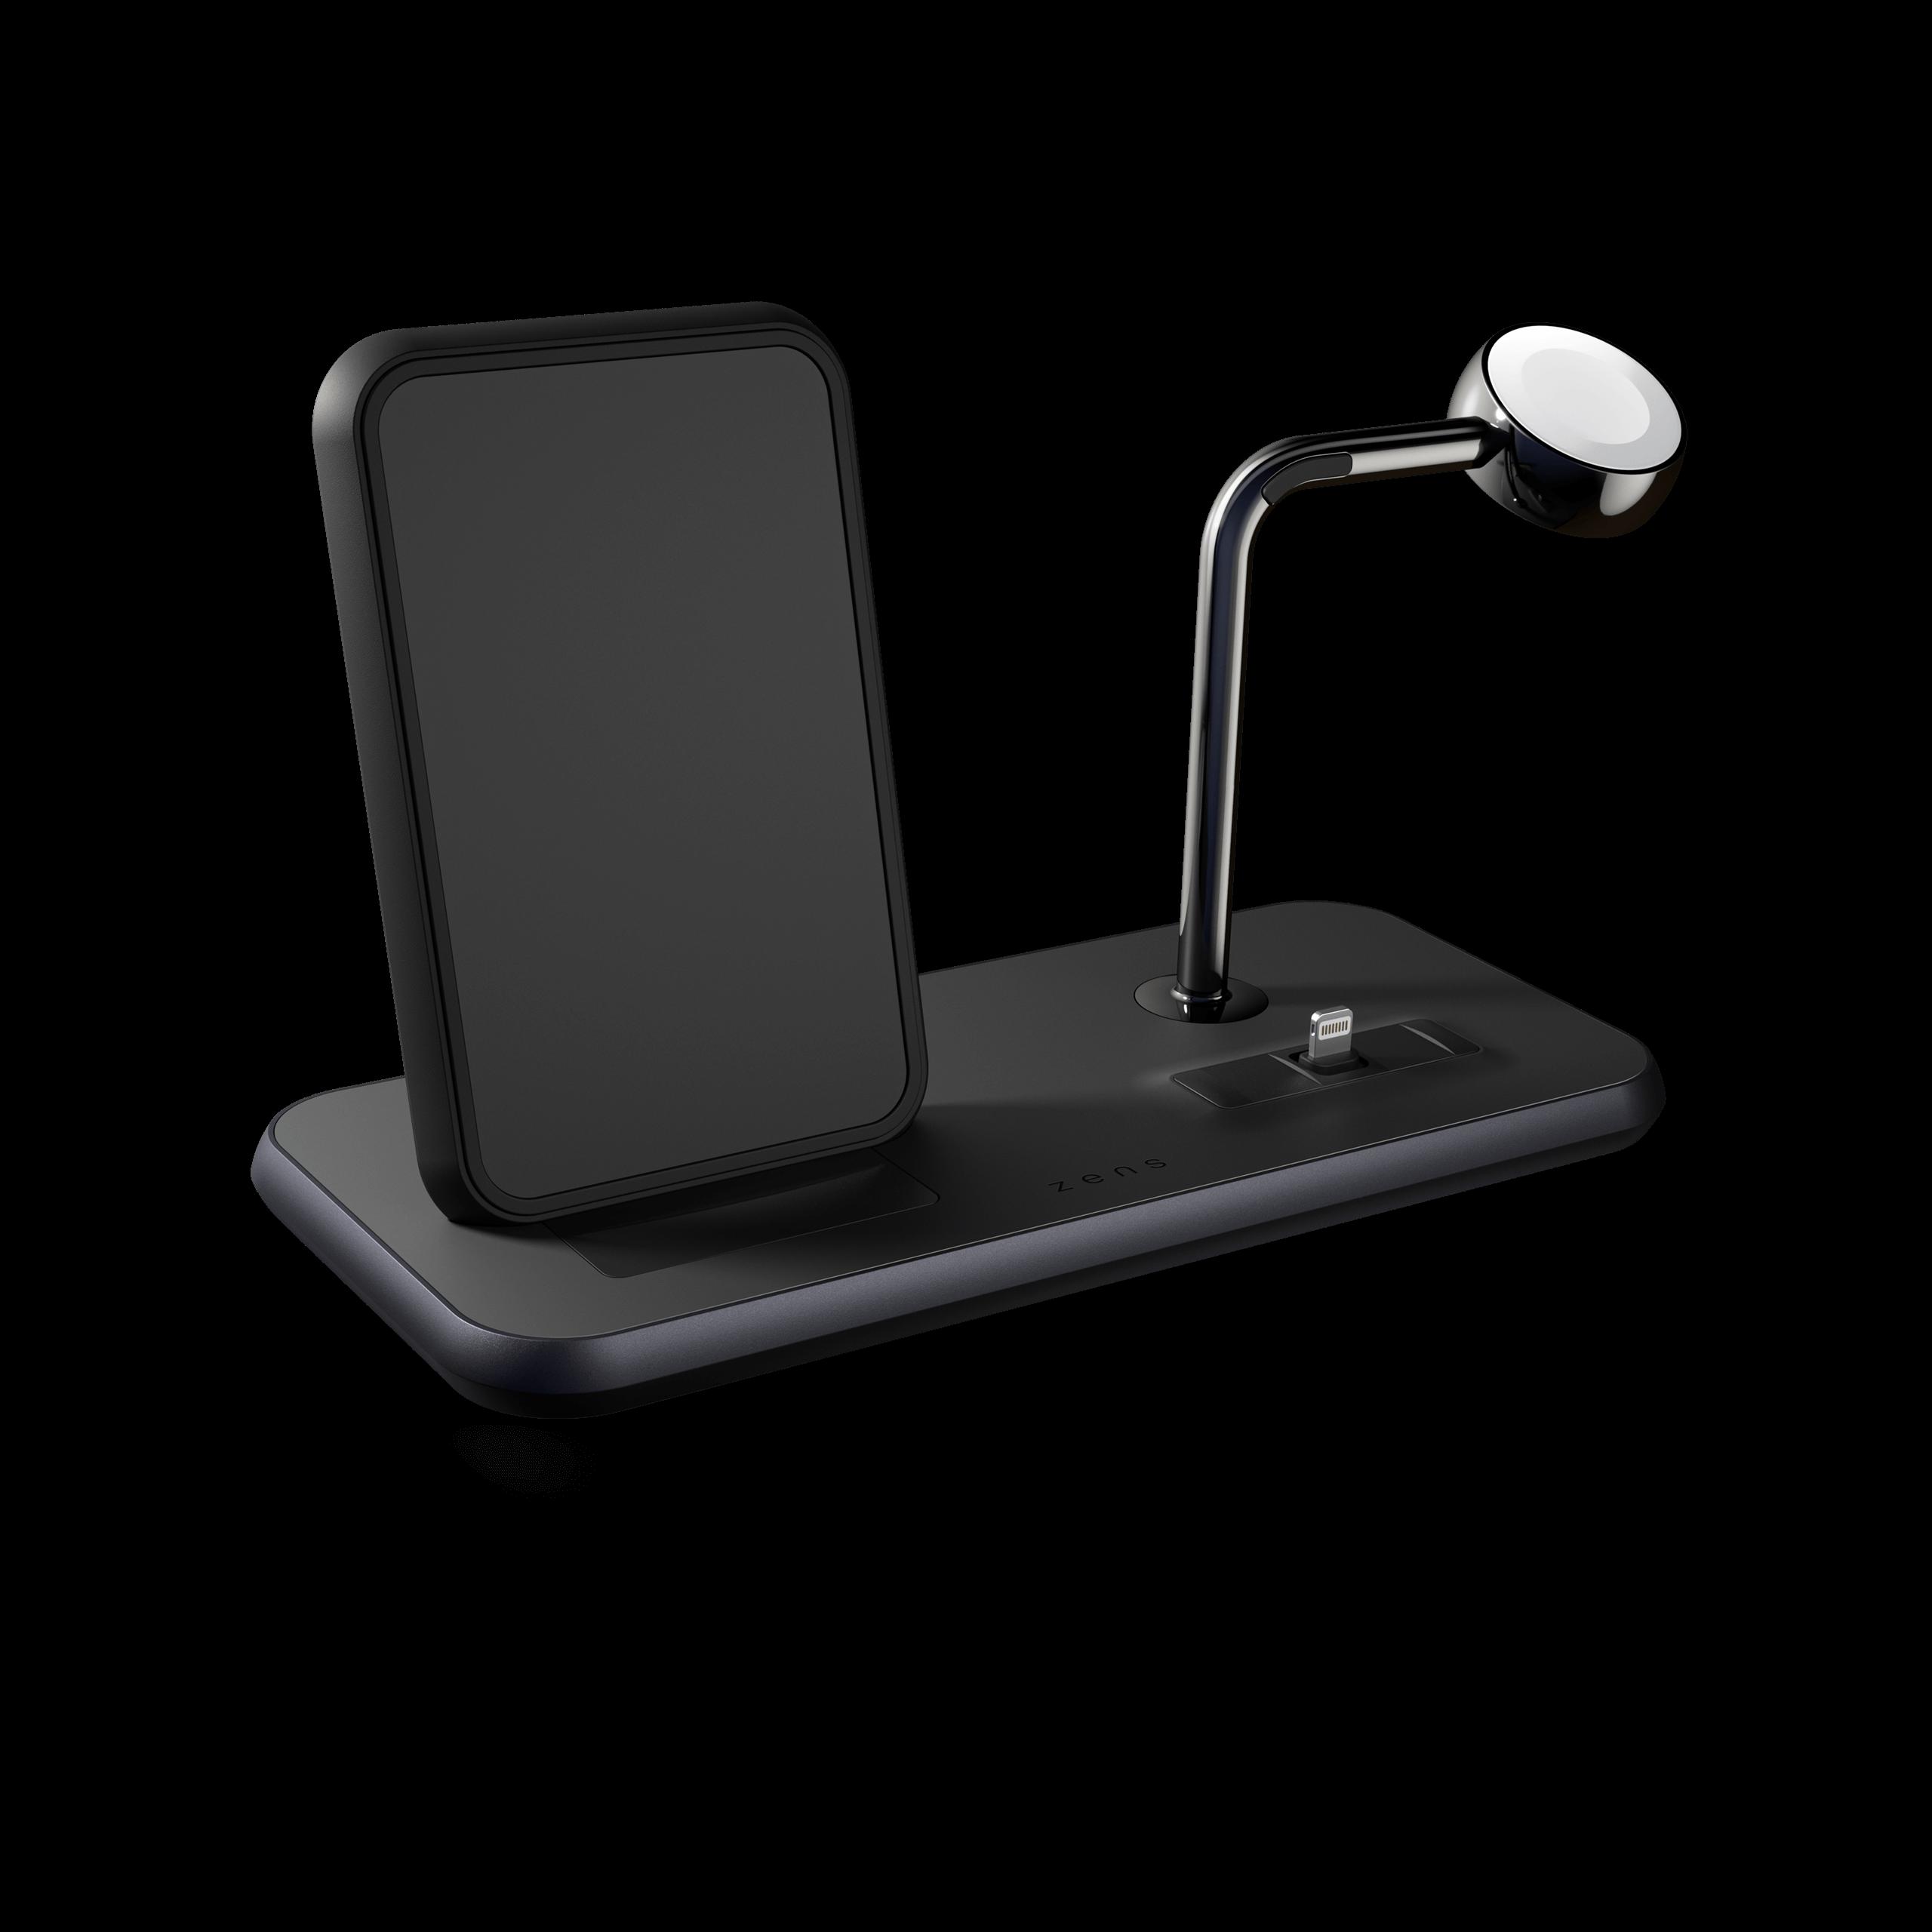 ZEDC07B - Zens Stand+Dock+Watch Aluminium Wireless Charger Front Side View